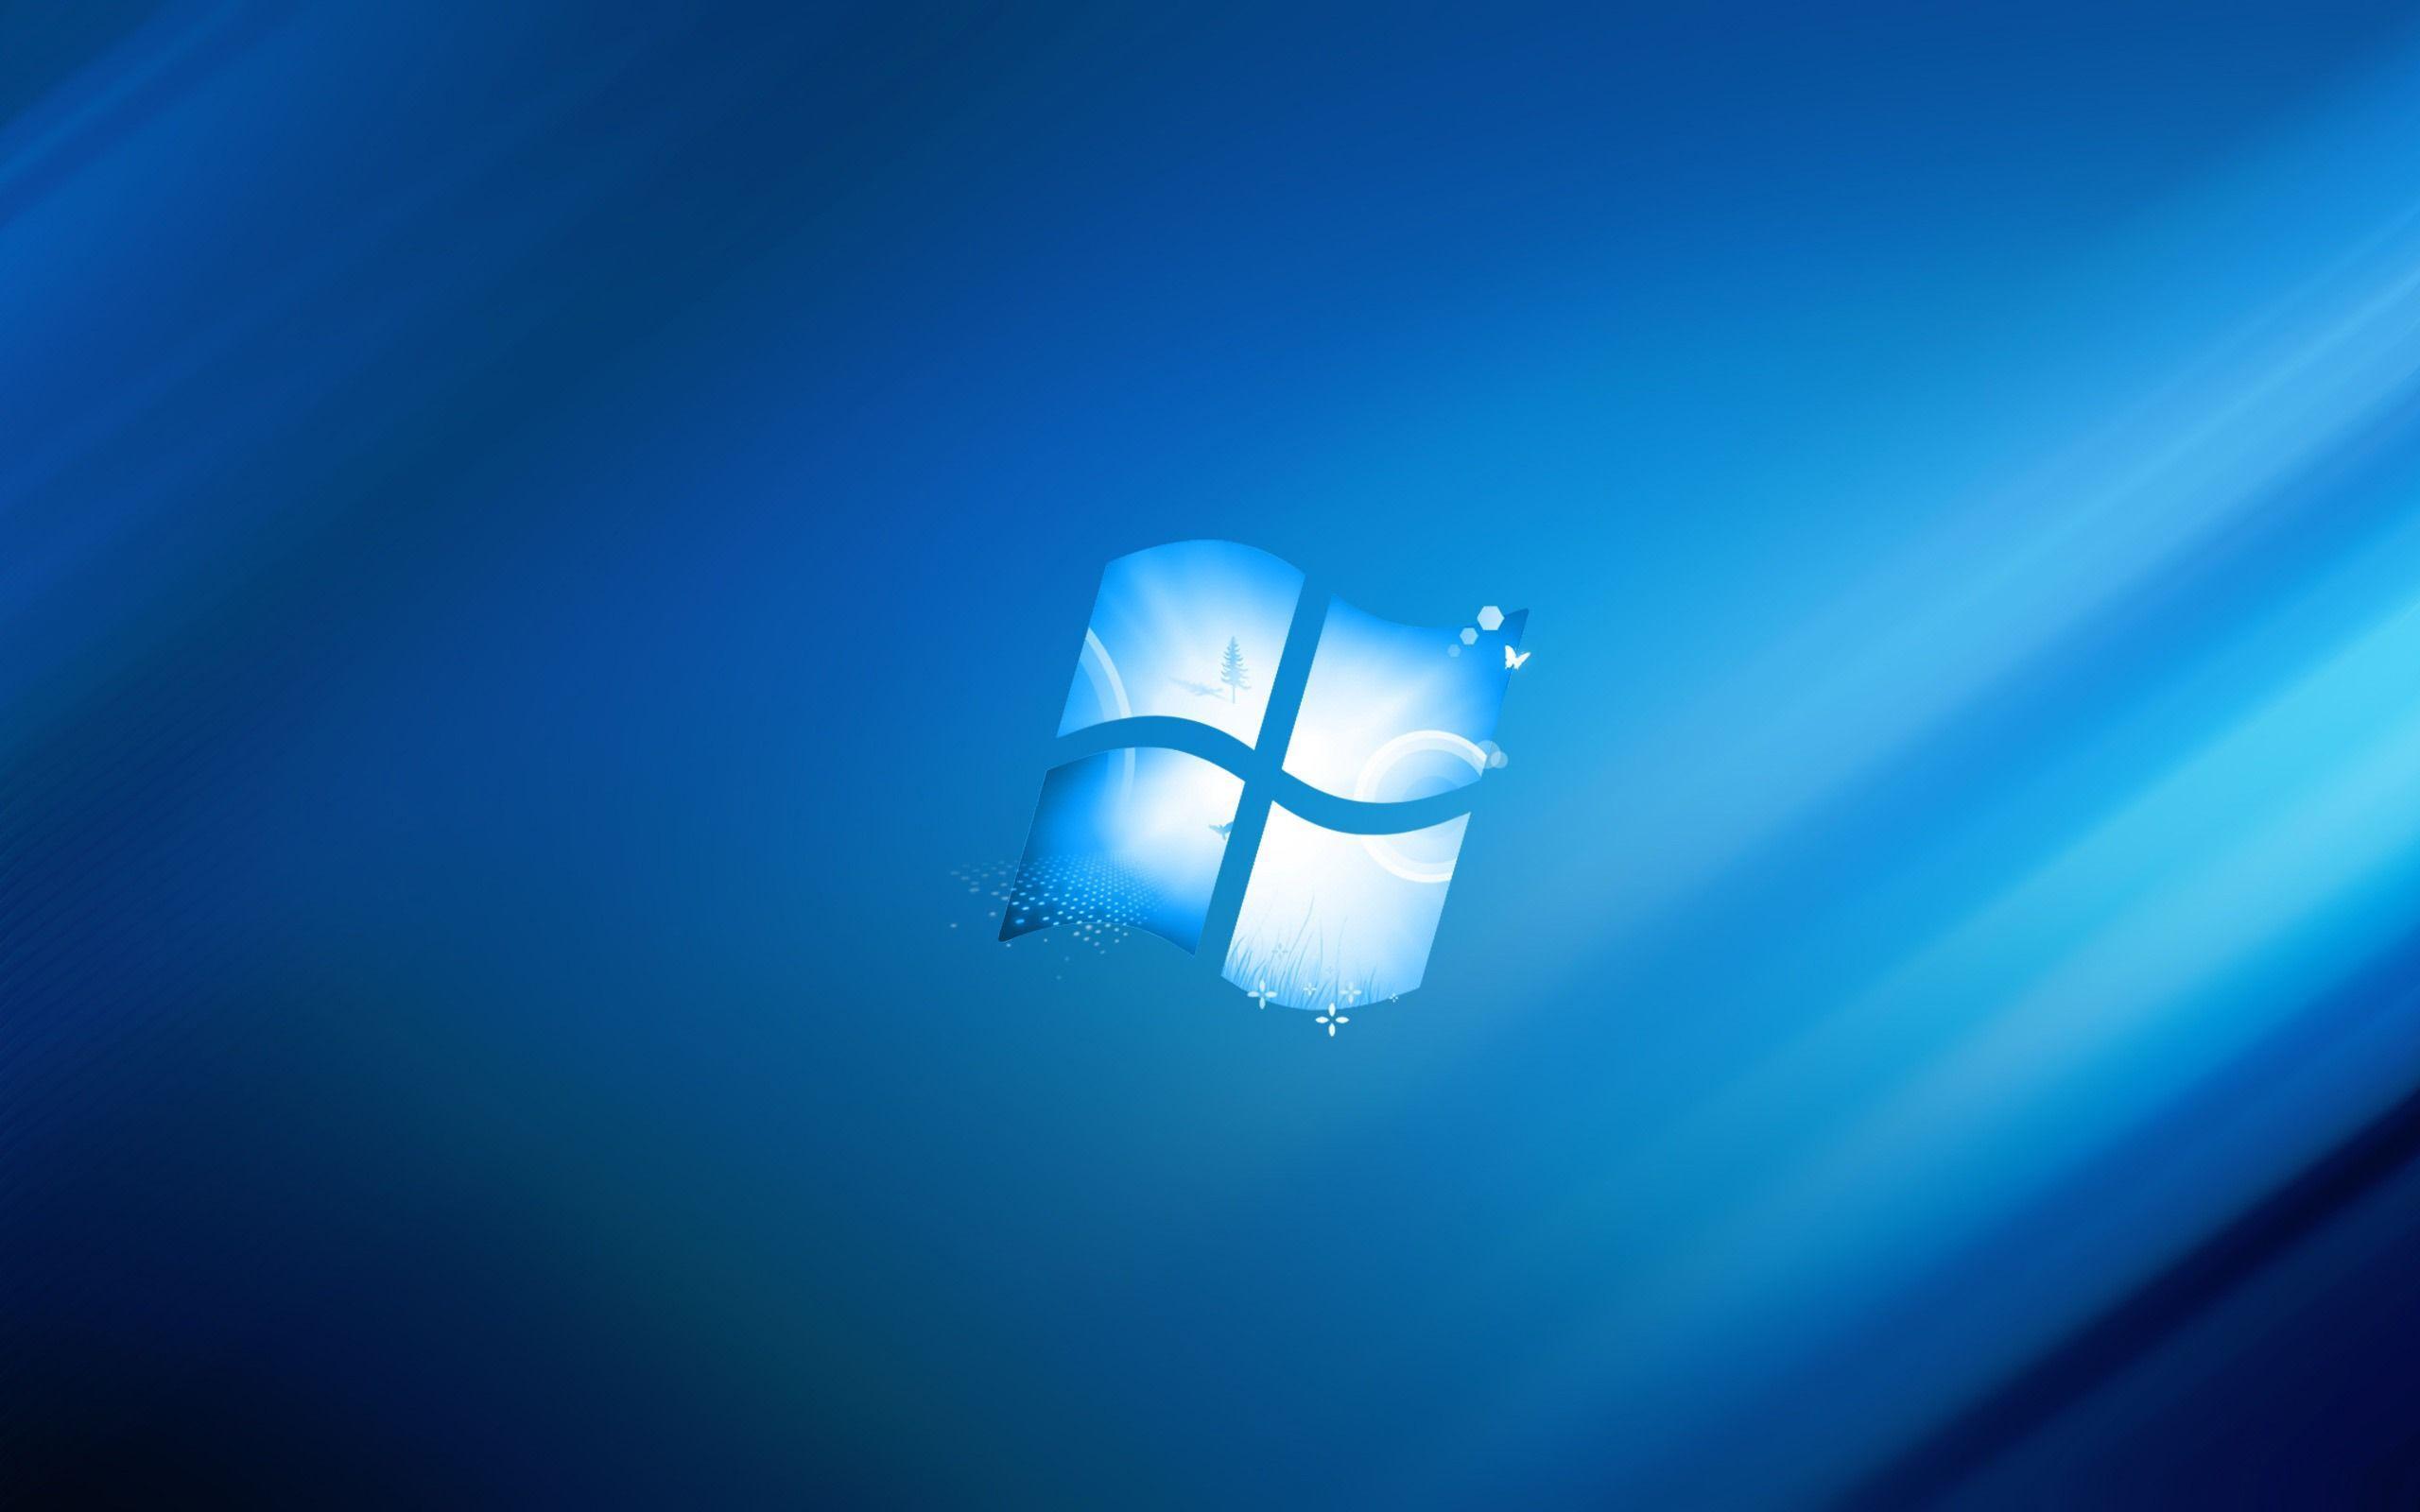 Microsoft Windows Desktop Backgrounds 2560x1600